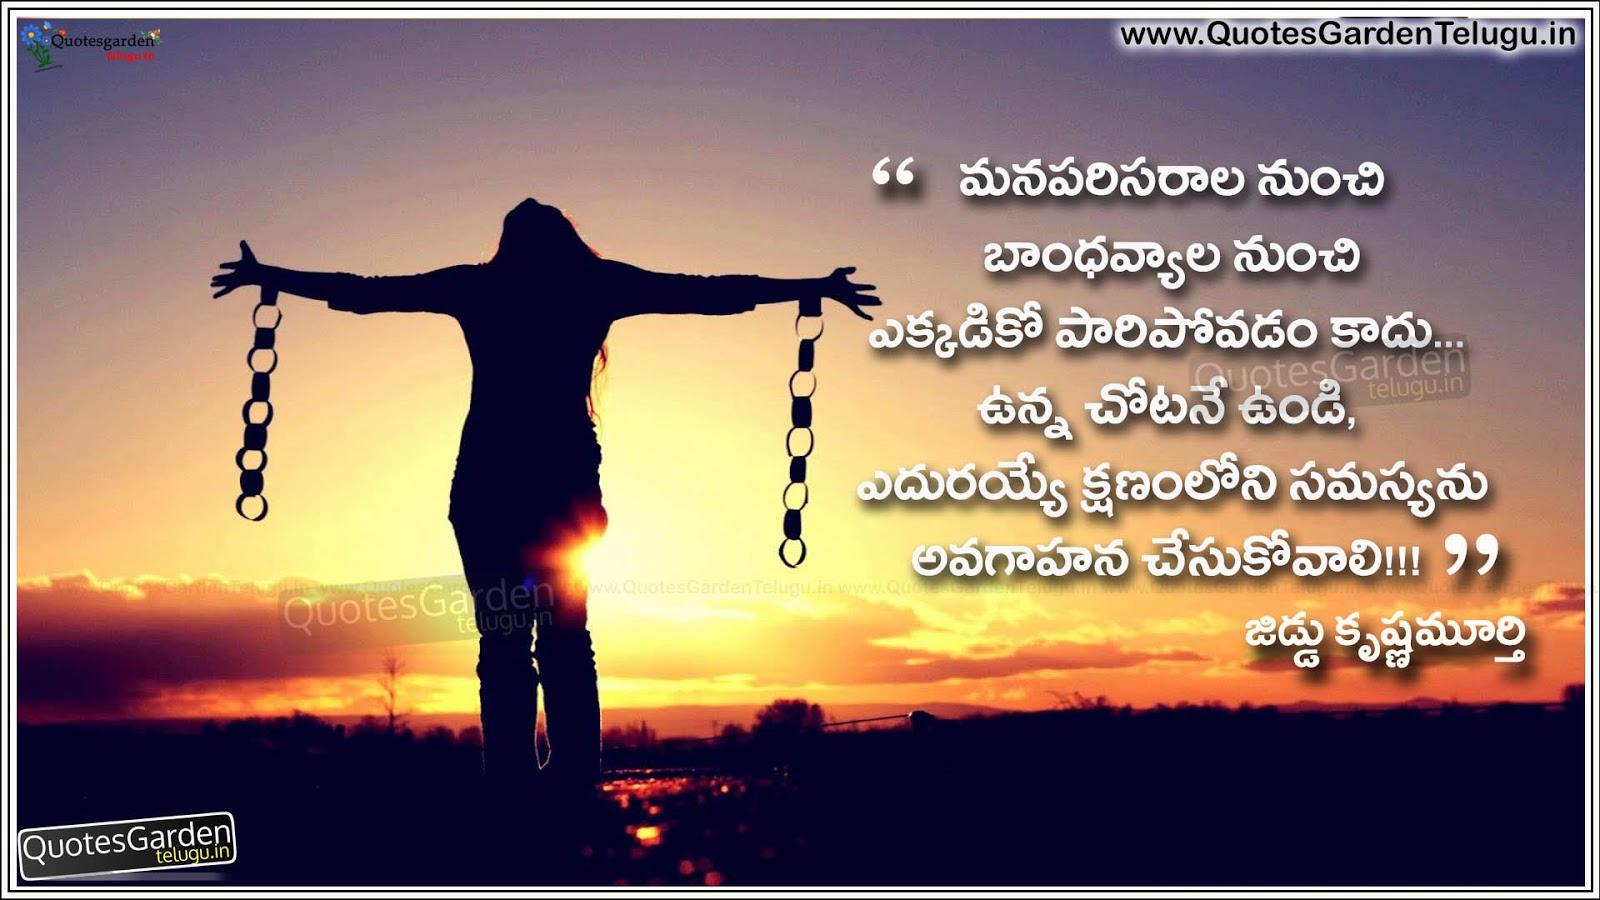 Hindi Quotes On Life Wallpapers Jiddu Krishnamurthy Telugu Inspirational Quotes Quotes